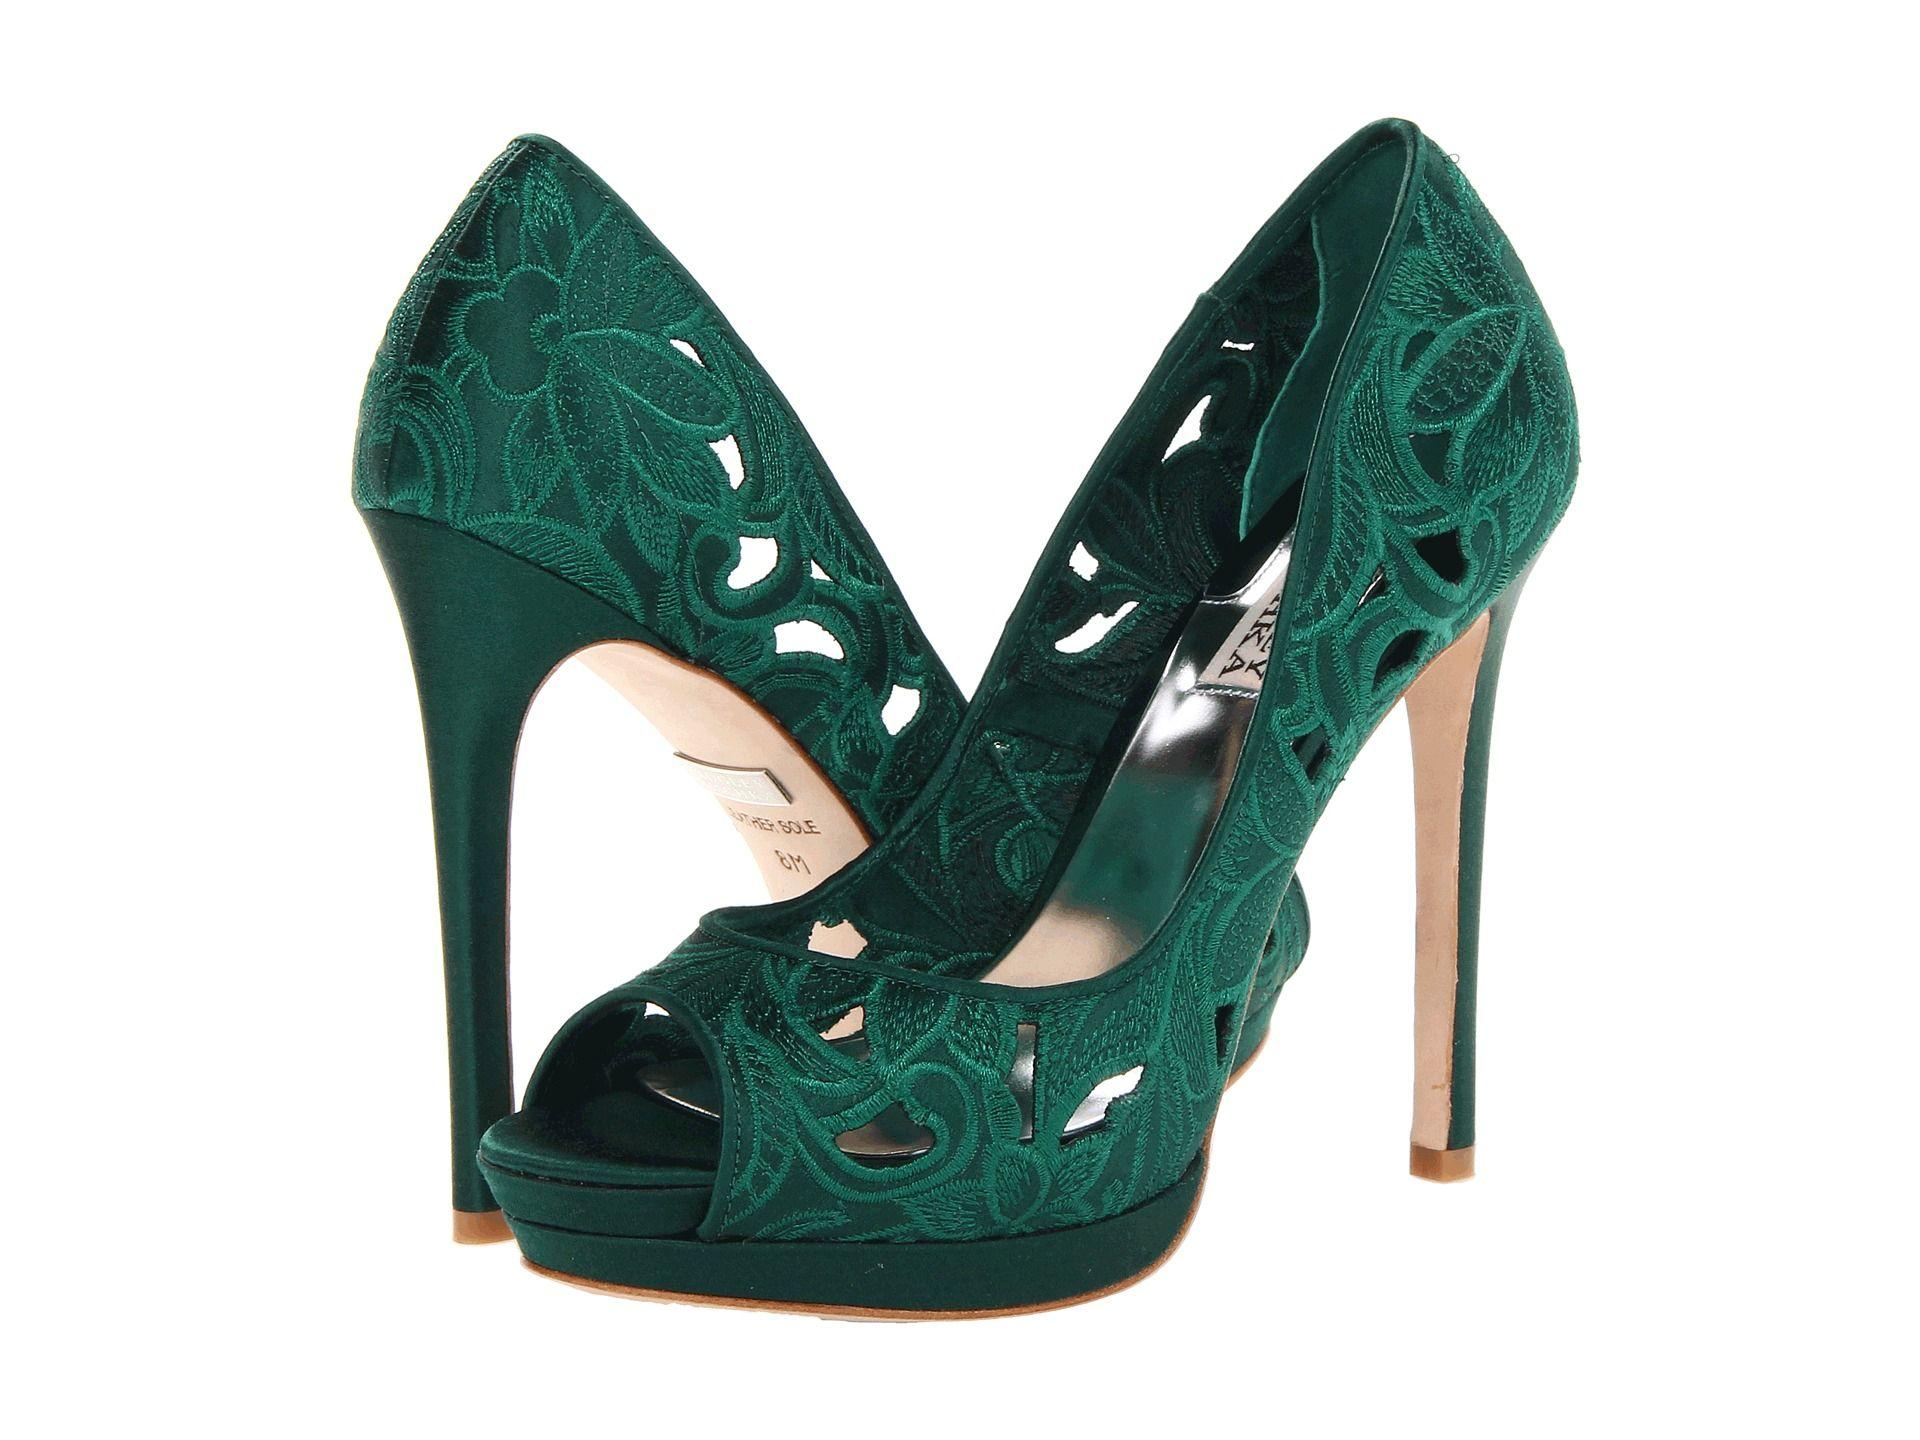 Green heels, Emerald green shoes